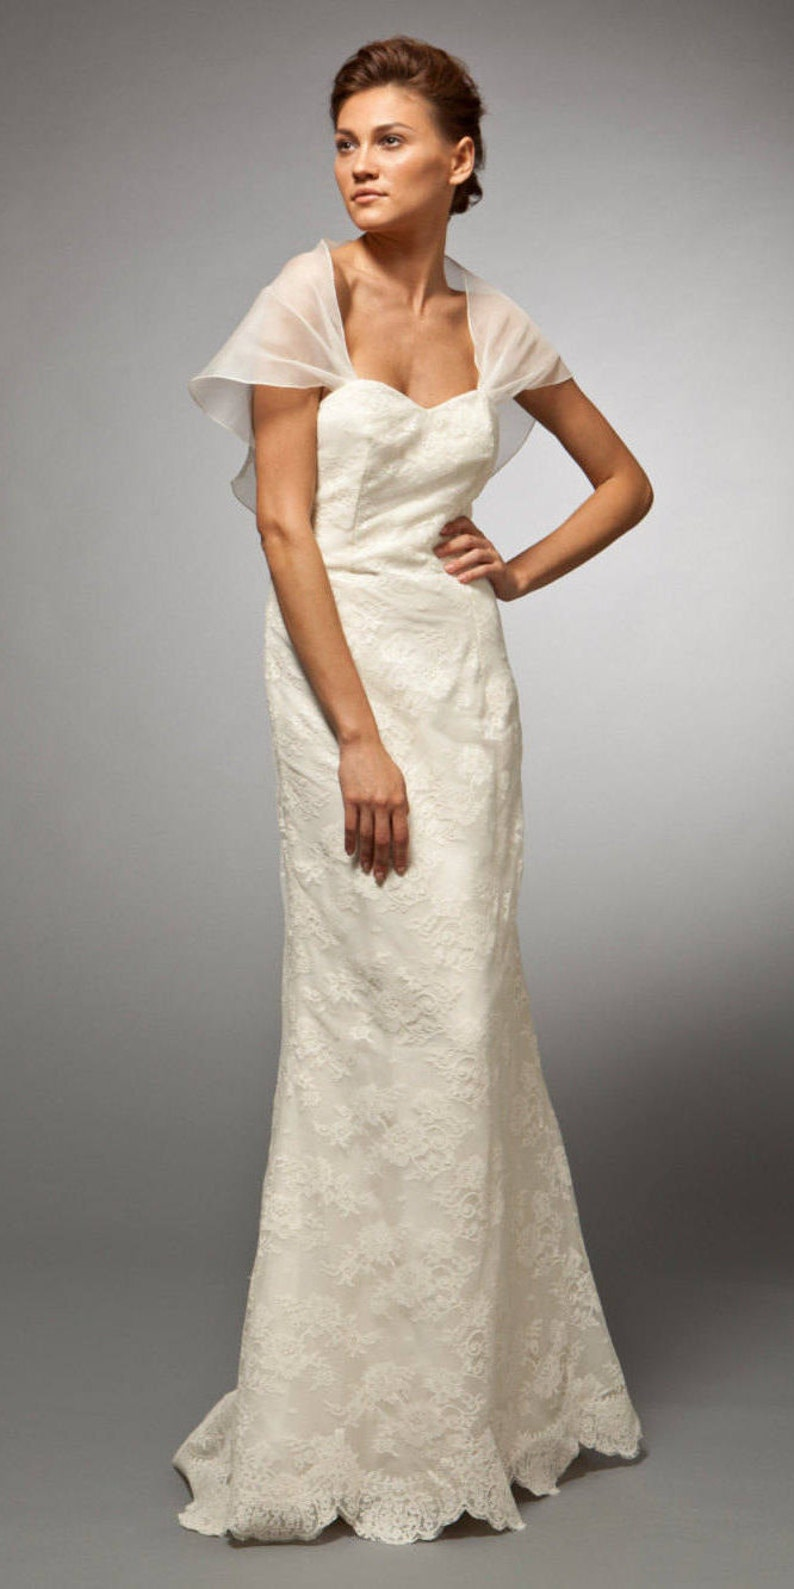 040fe492203 Wedding Dress Bridal Gown French Lace Detachable Cape Slim